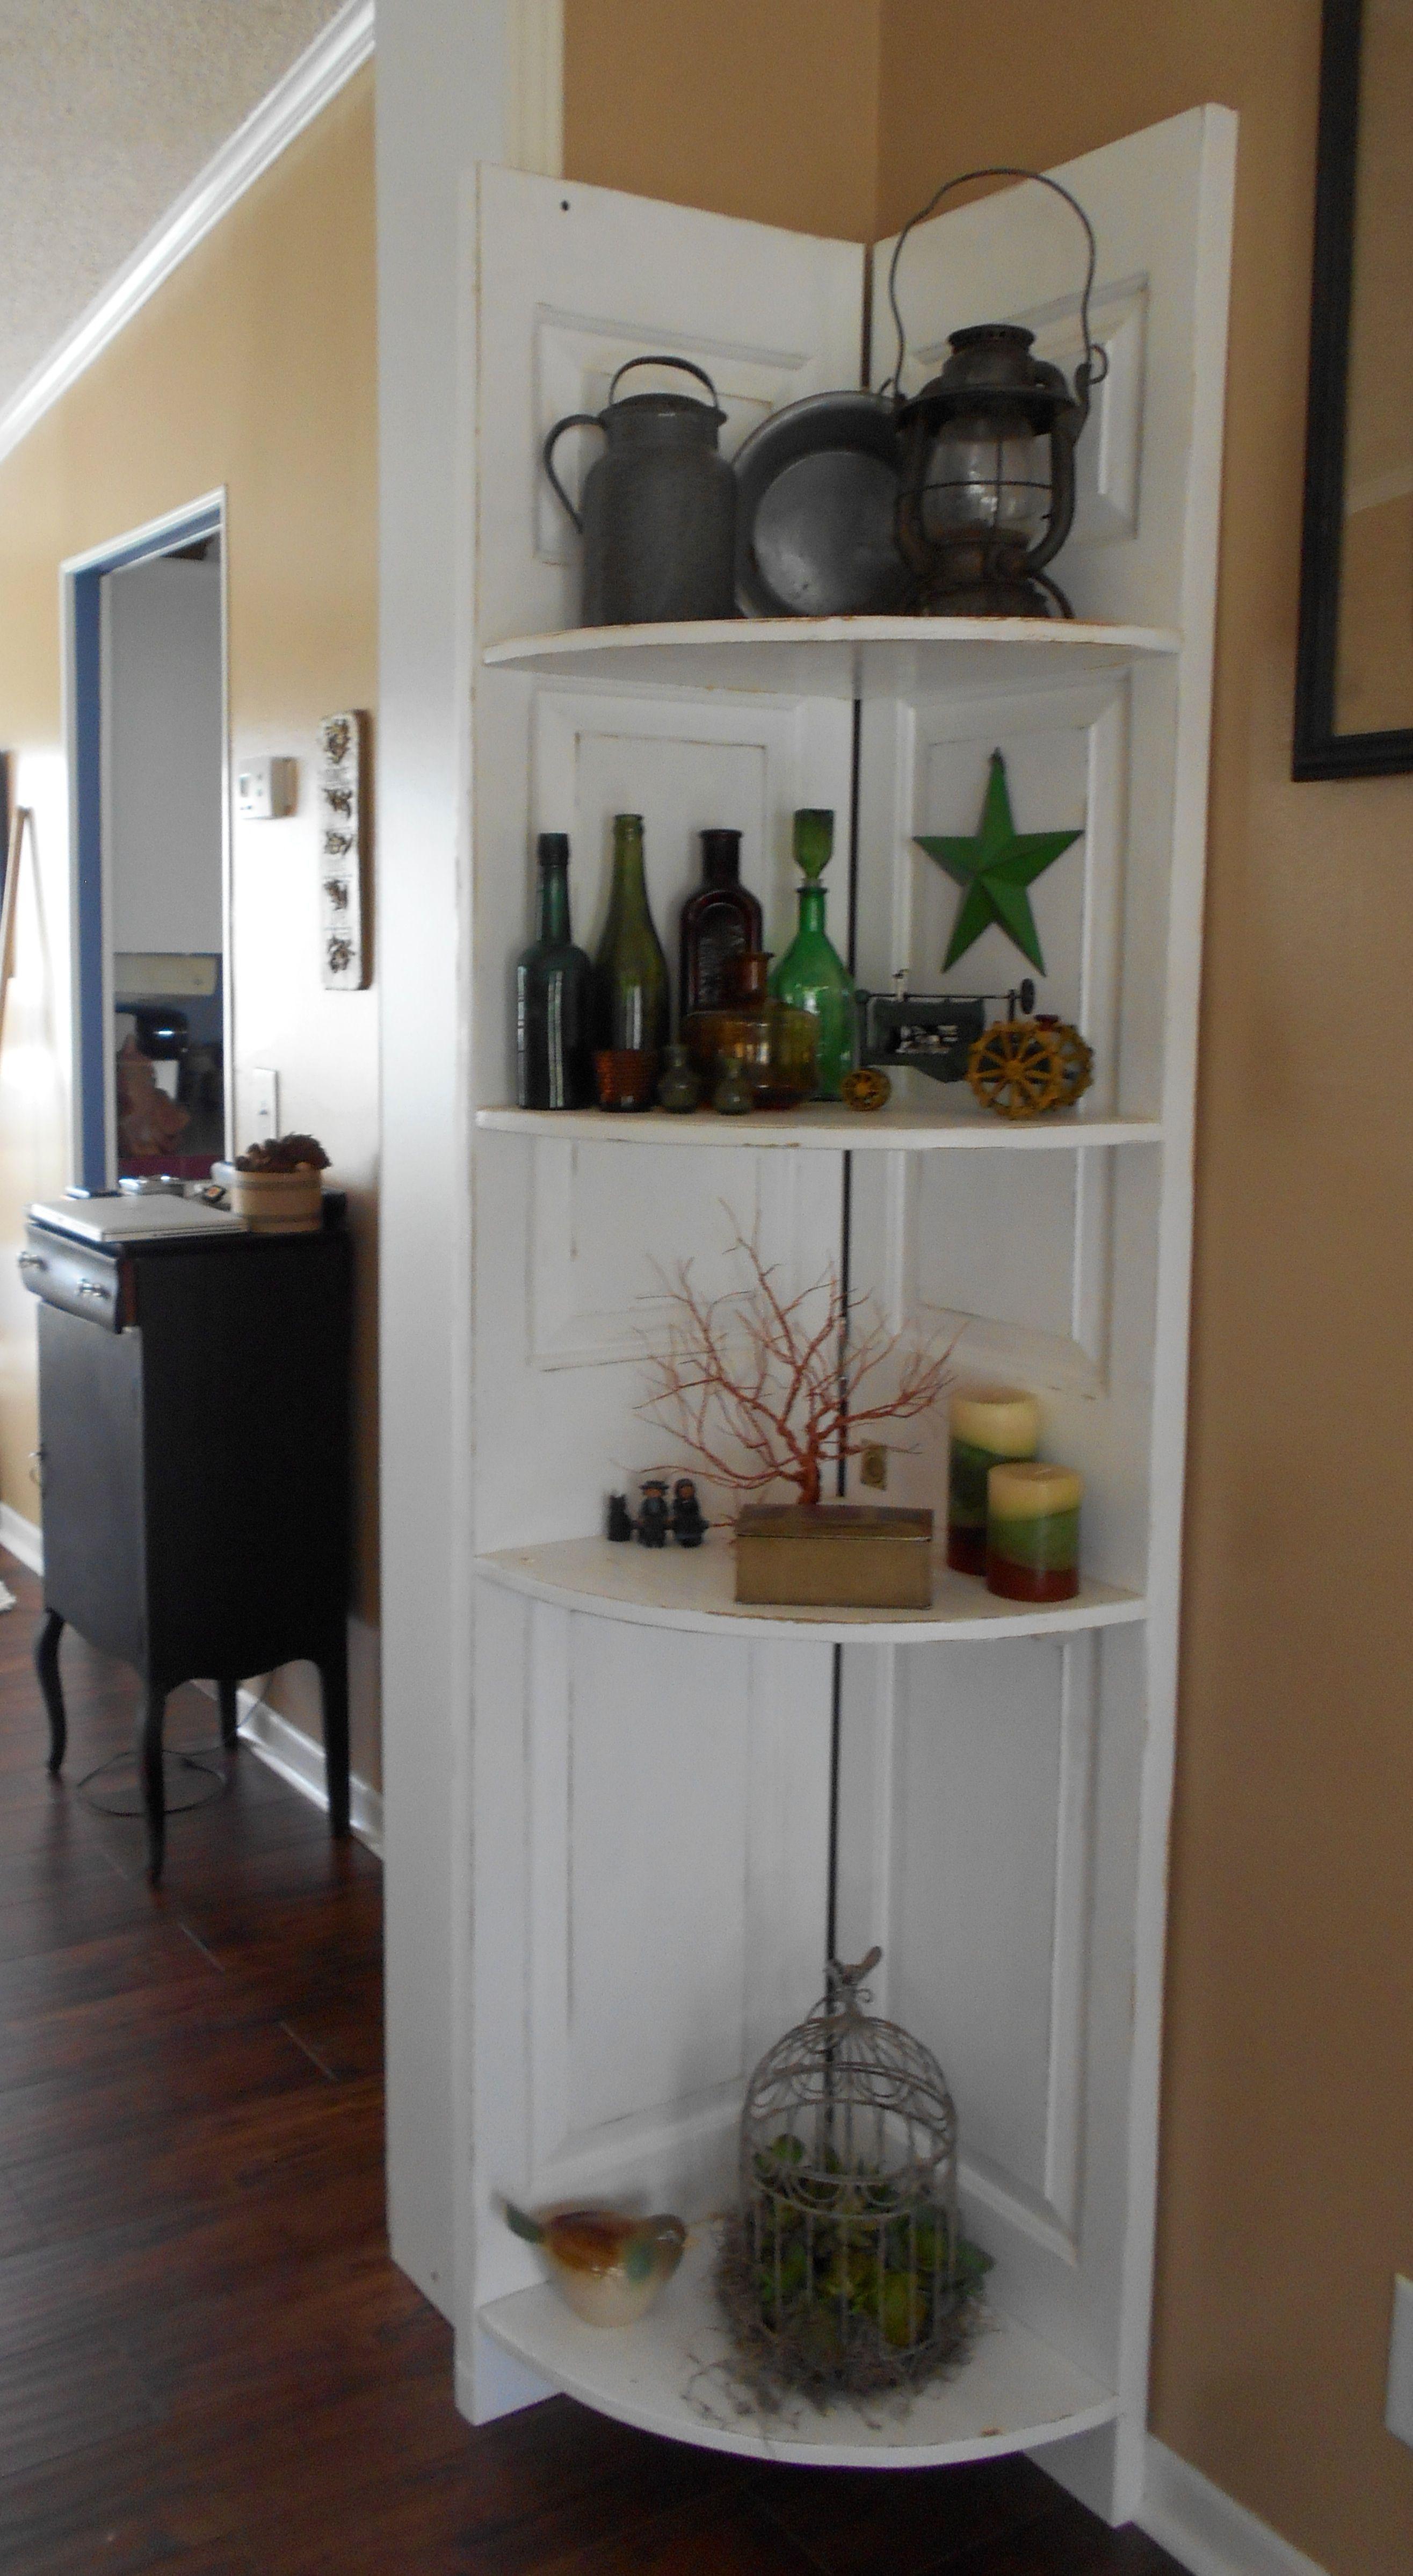 23 Stunningly Corner Shelf Ideas A Guide For Housekeeping Door Corner Shelves Corner Bookshelves Doors Repurposed